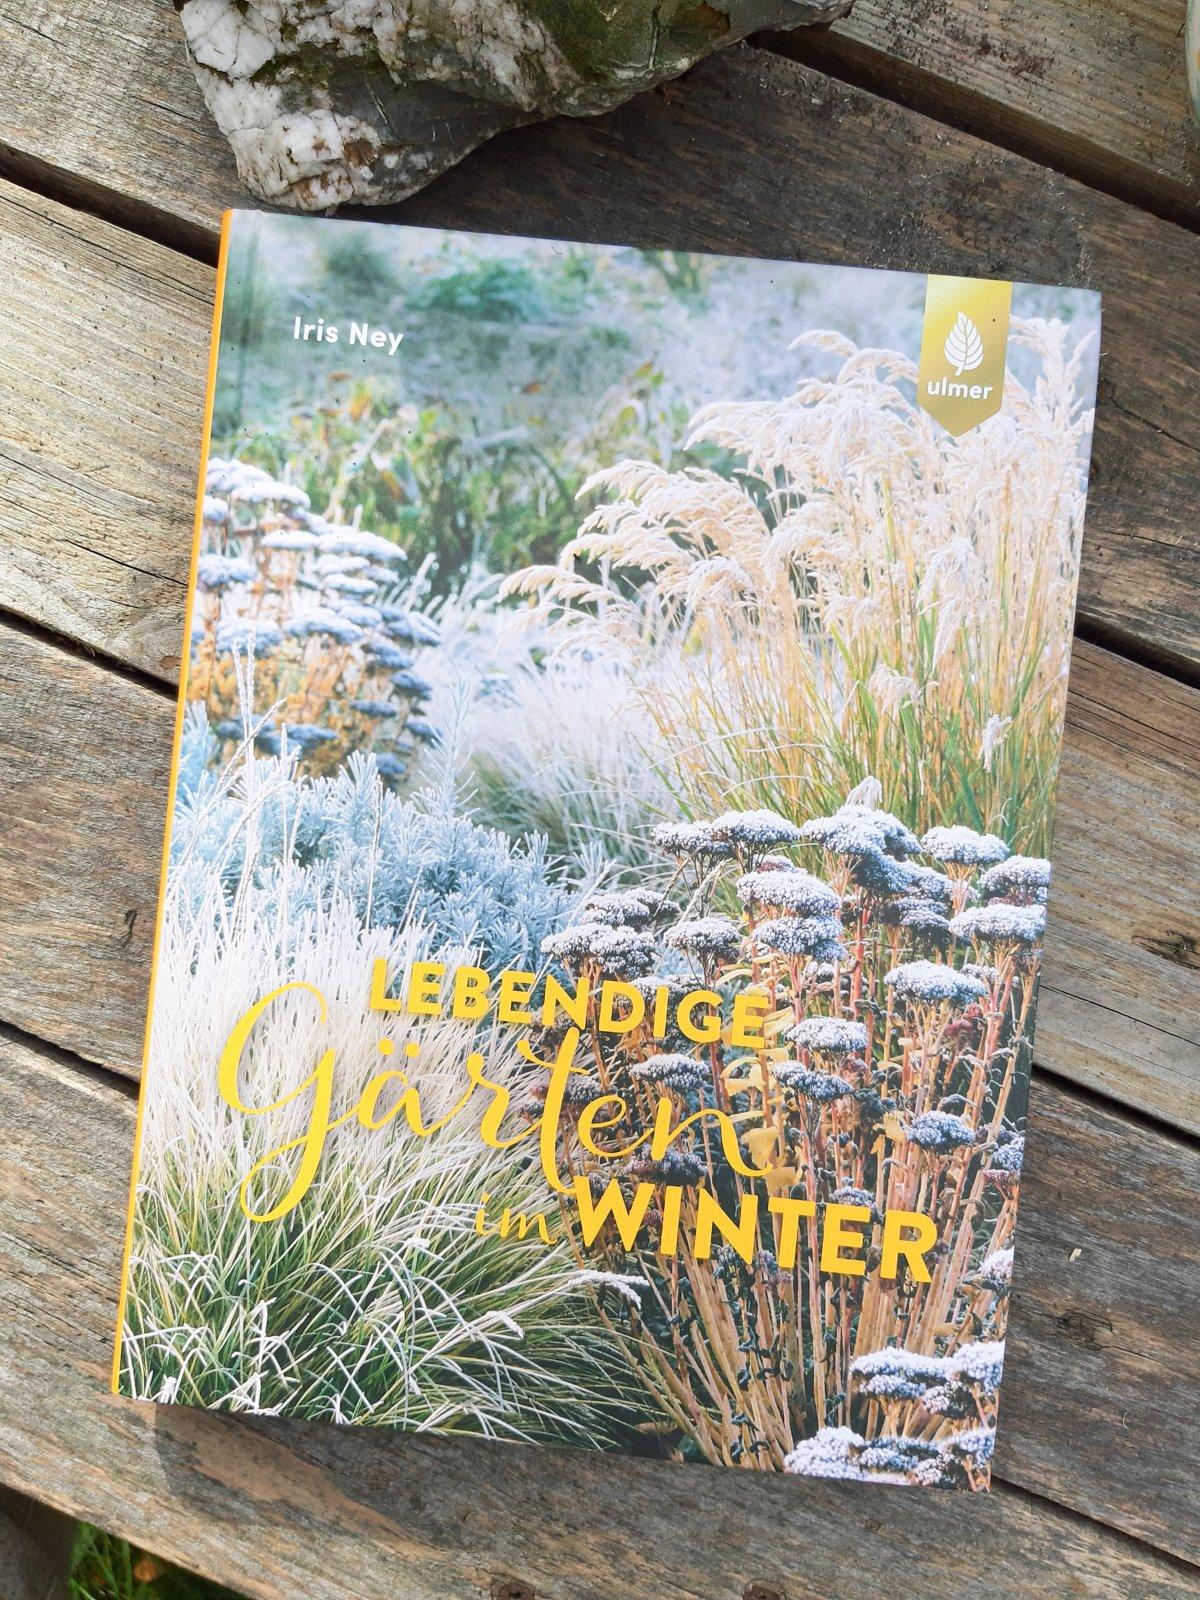 Iris Ney Lebendige Gärten im WInter